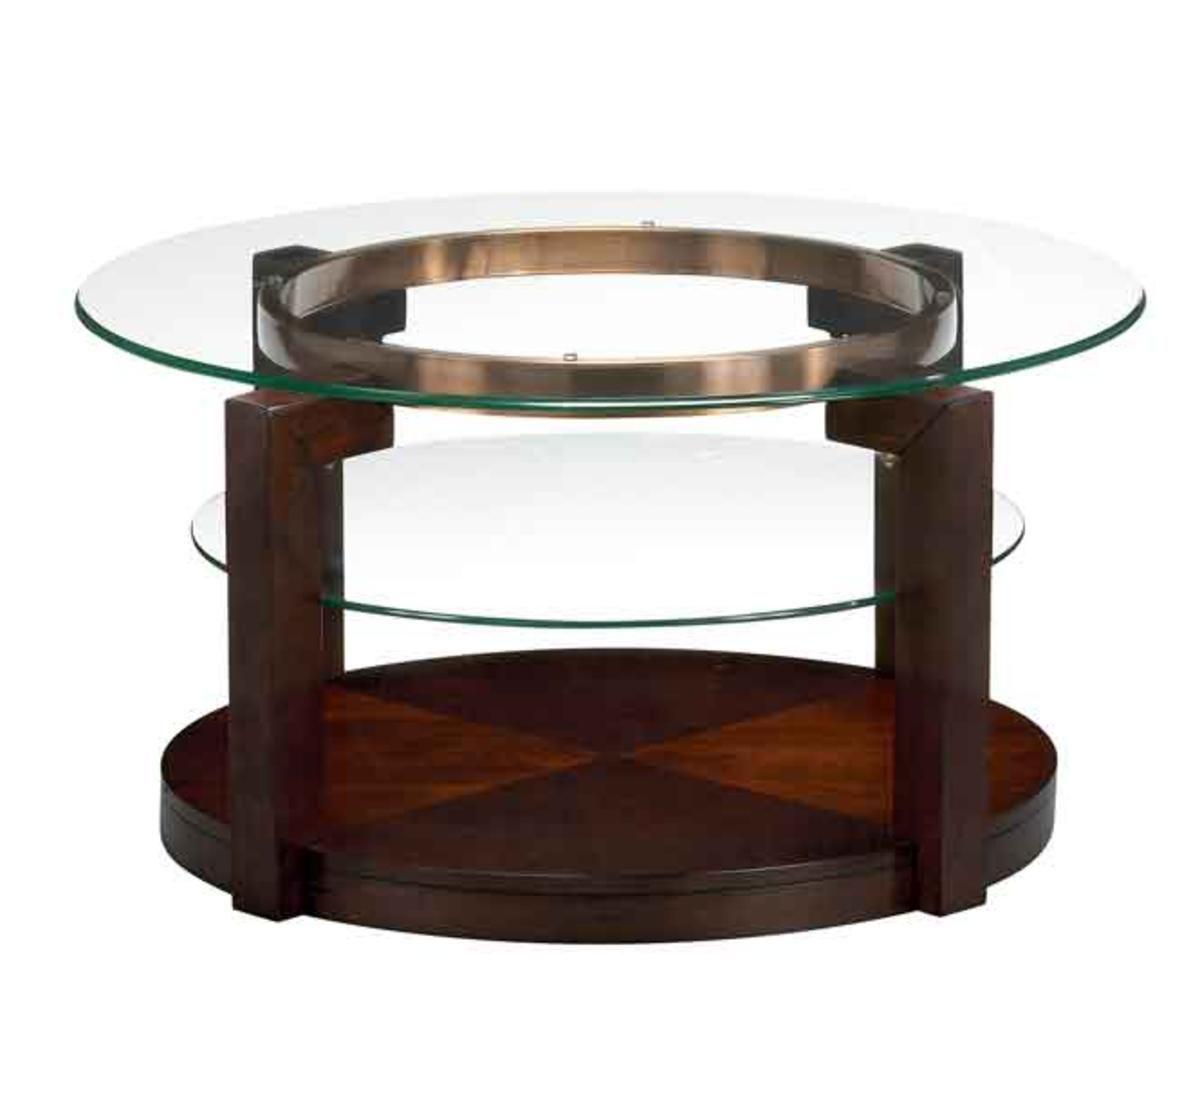 Picture of CORONADO II COFFEE TABLE